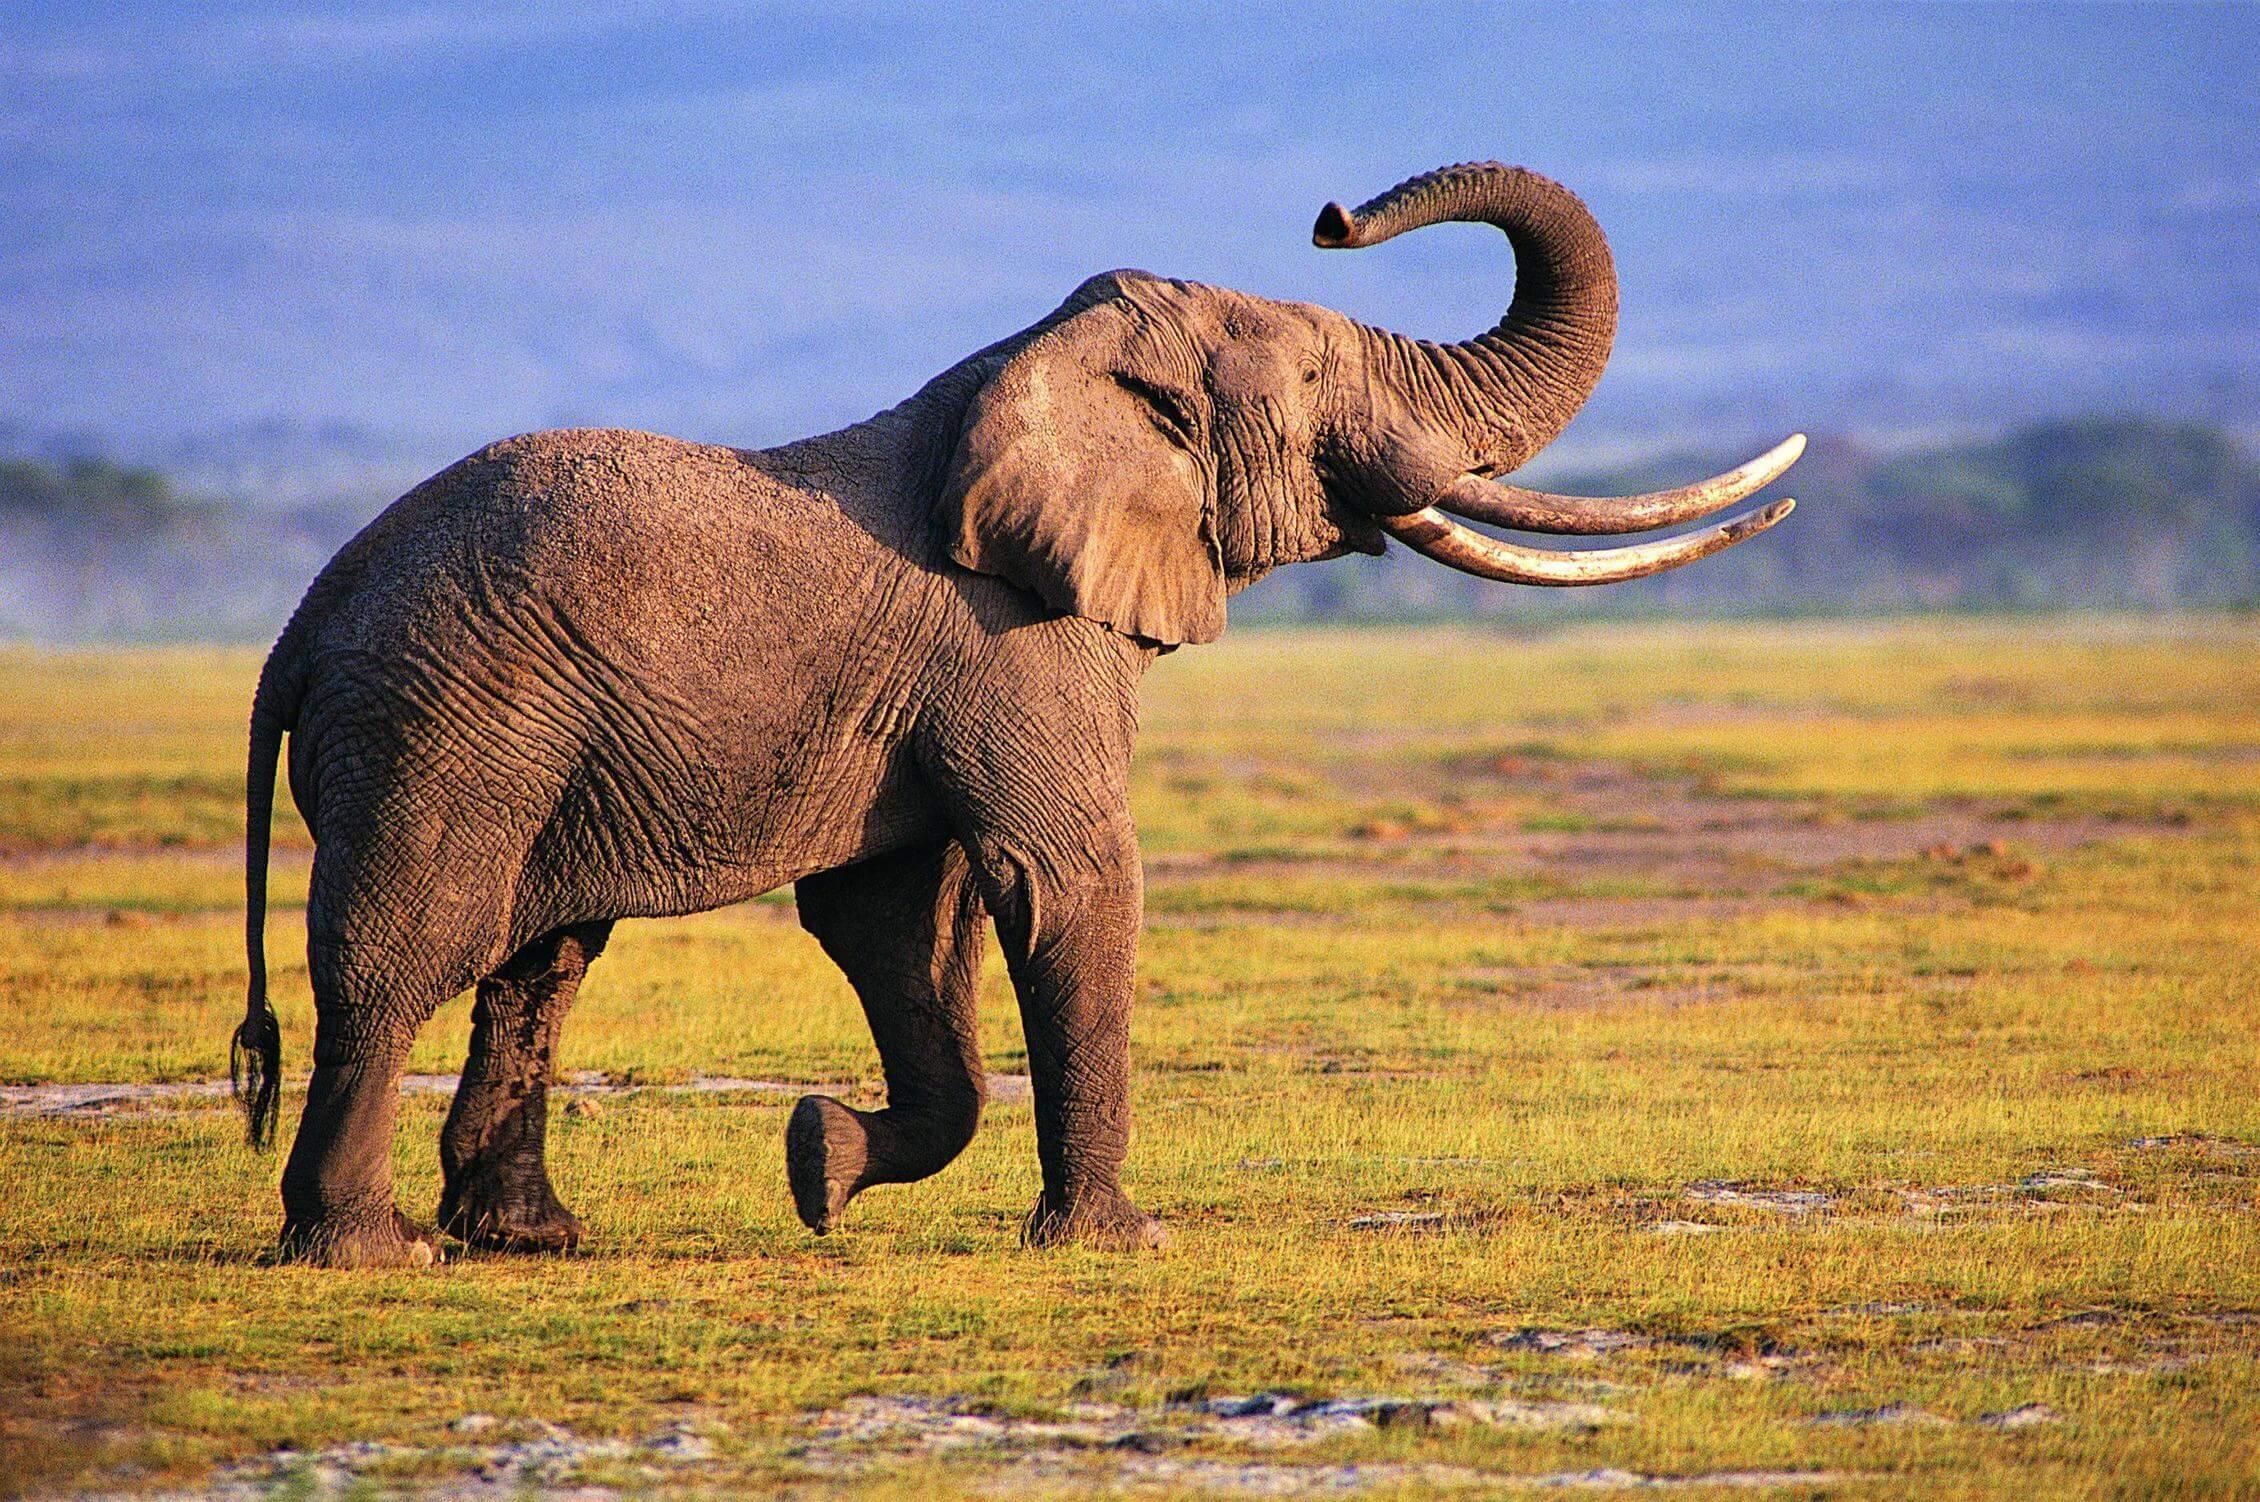 5 Days Kenya Holiday Travel & Tour Package